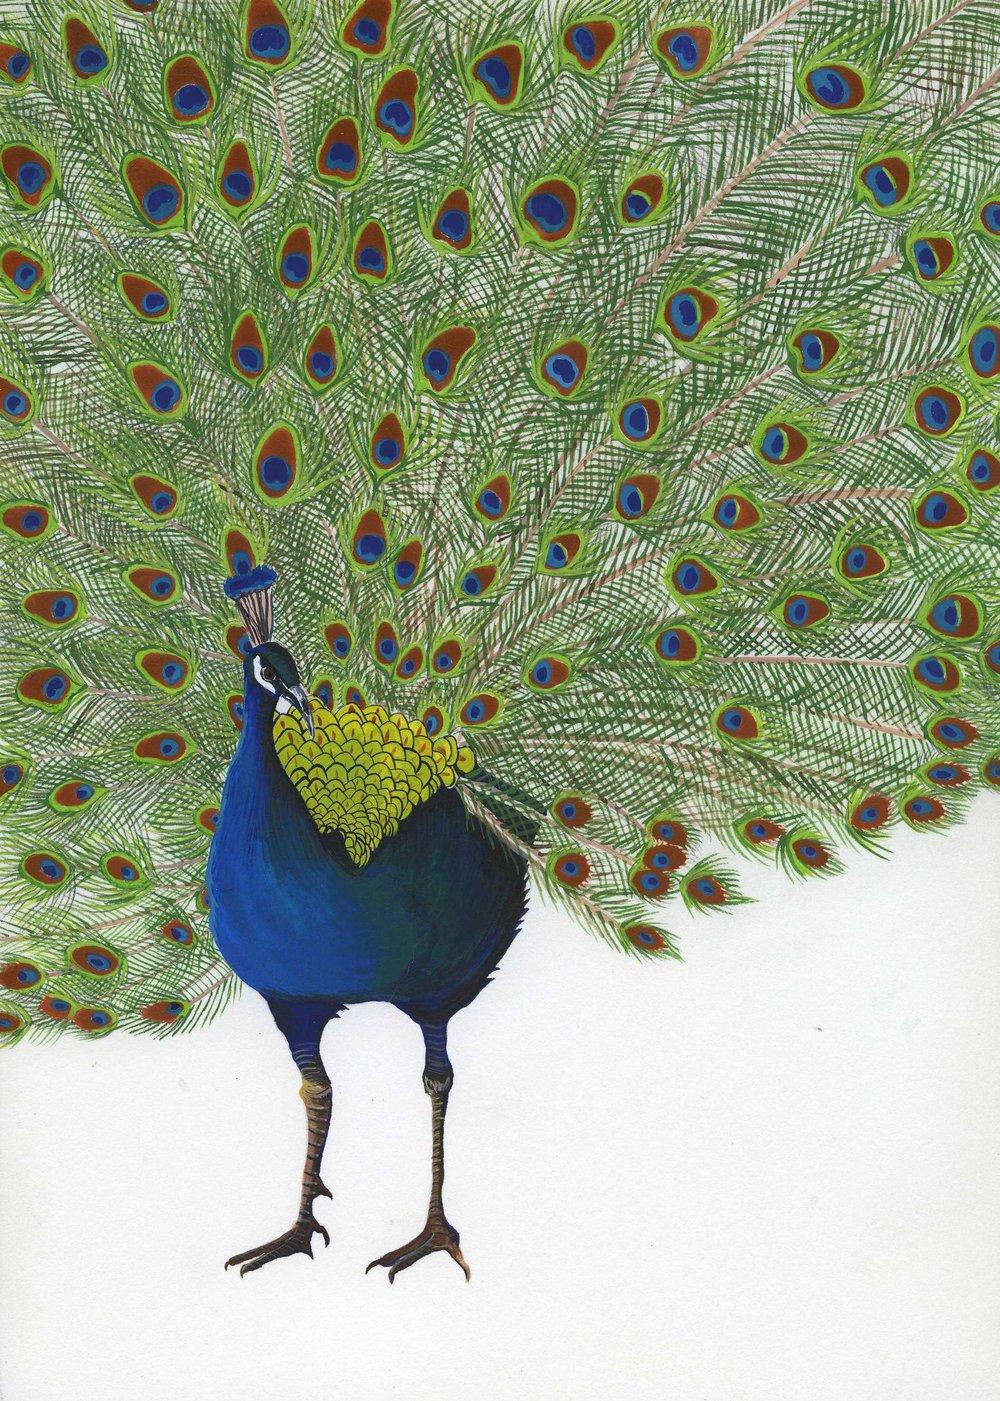 Peacock_Ana Maria Velasco.jpg